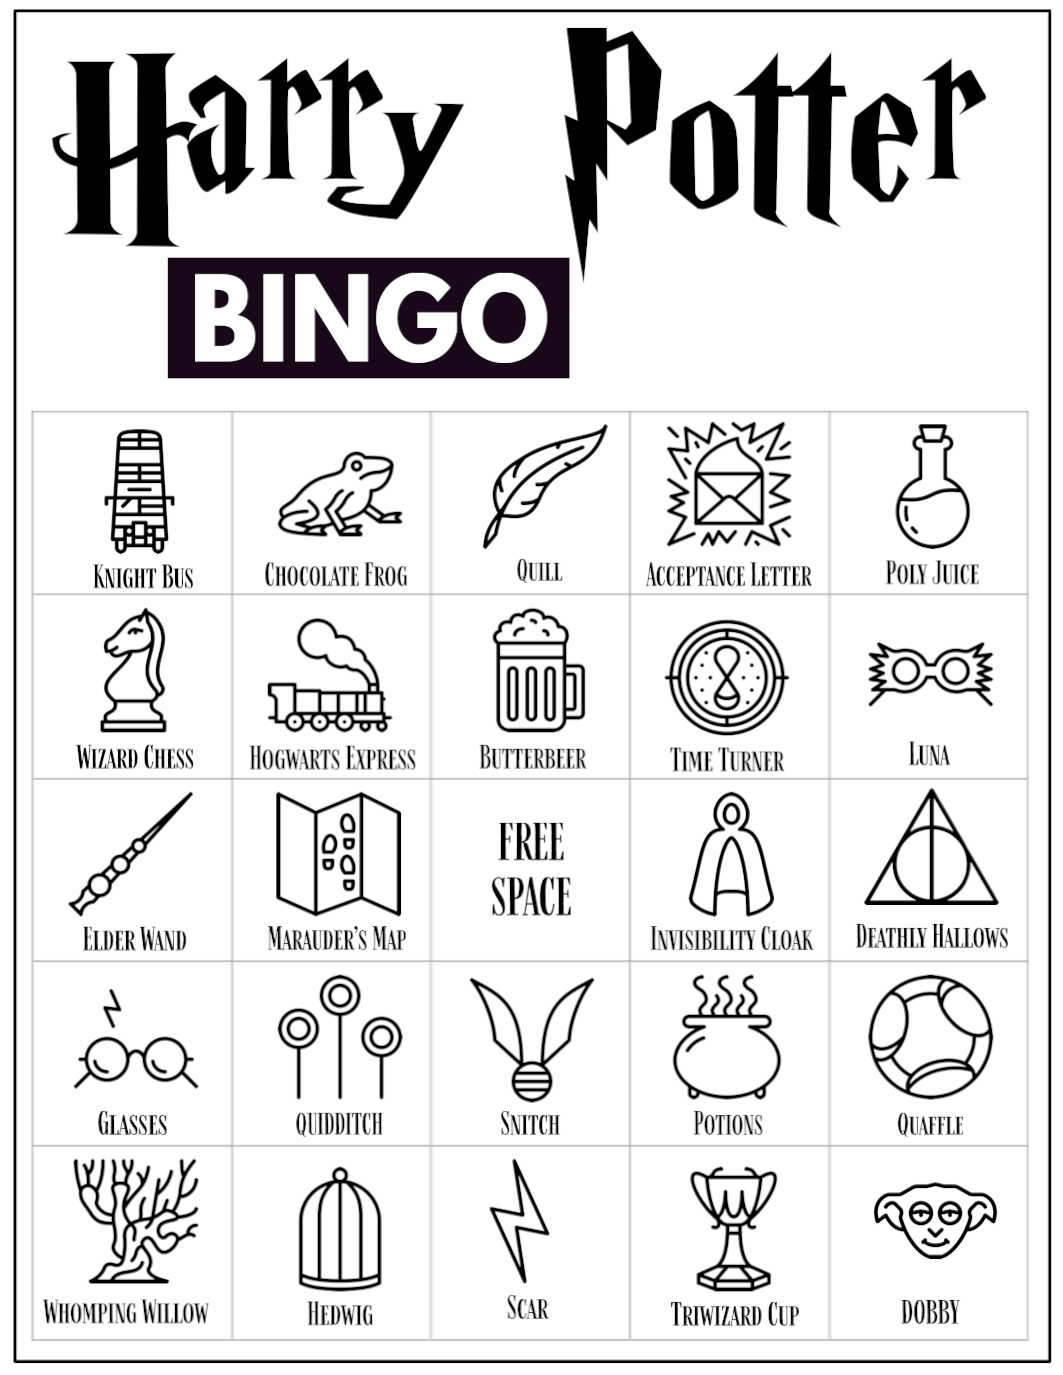 Free Printable Harry Potter Bingo Game